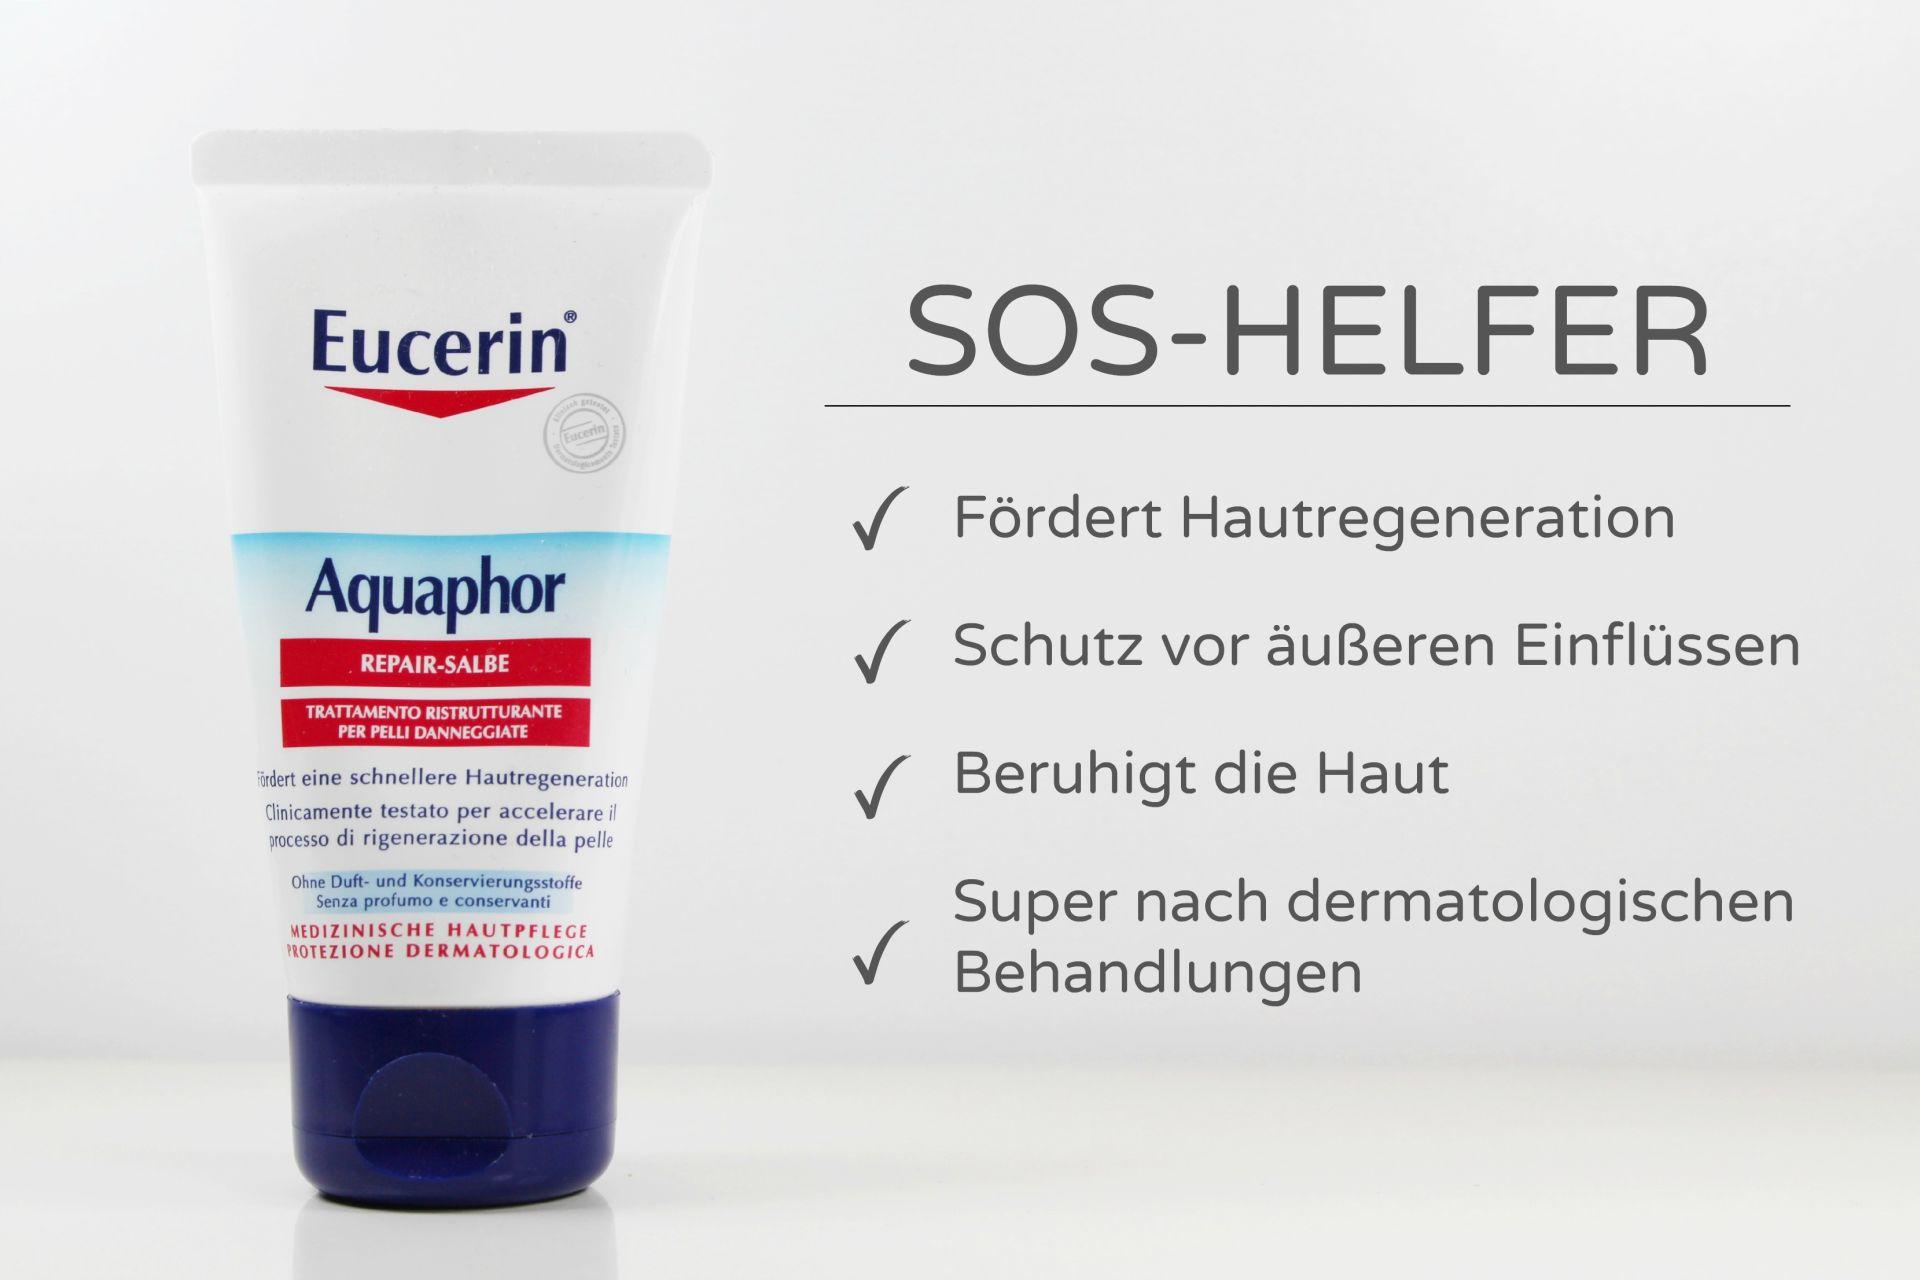 Eucerin Aquaphor, Eucerin Aquaphor Repair-Salbe, Fettsalbe, trockene Haut, Mineralöl in Kosmetik, Super Twins Annalena und Magdalena